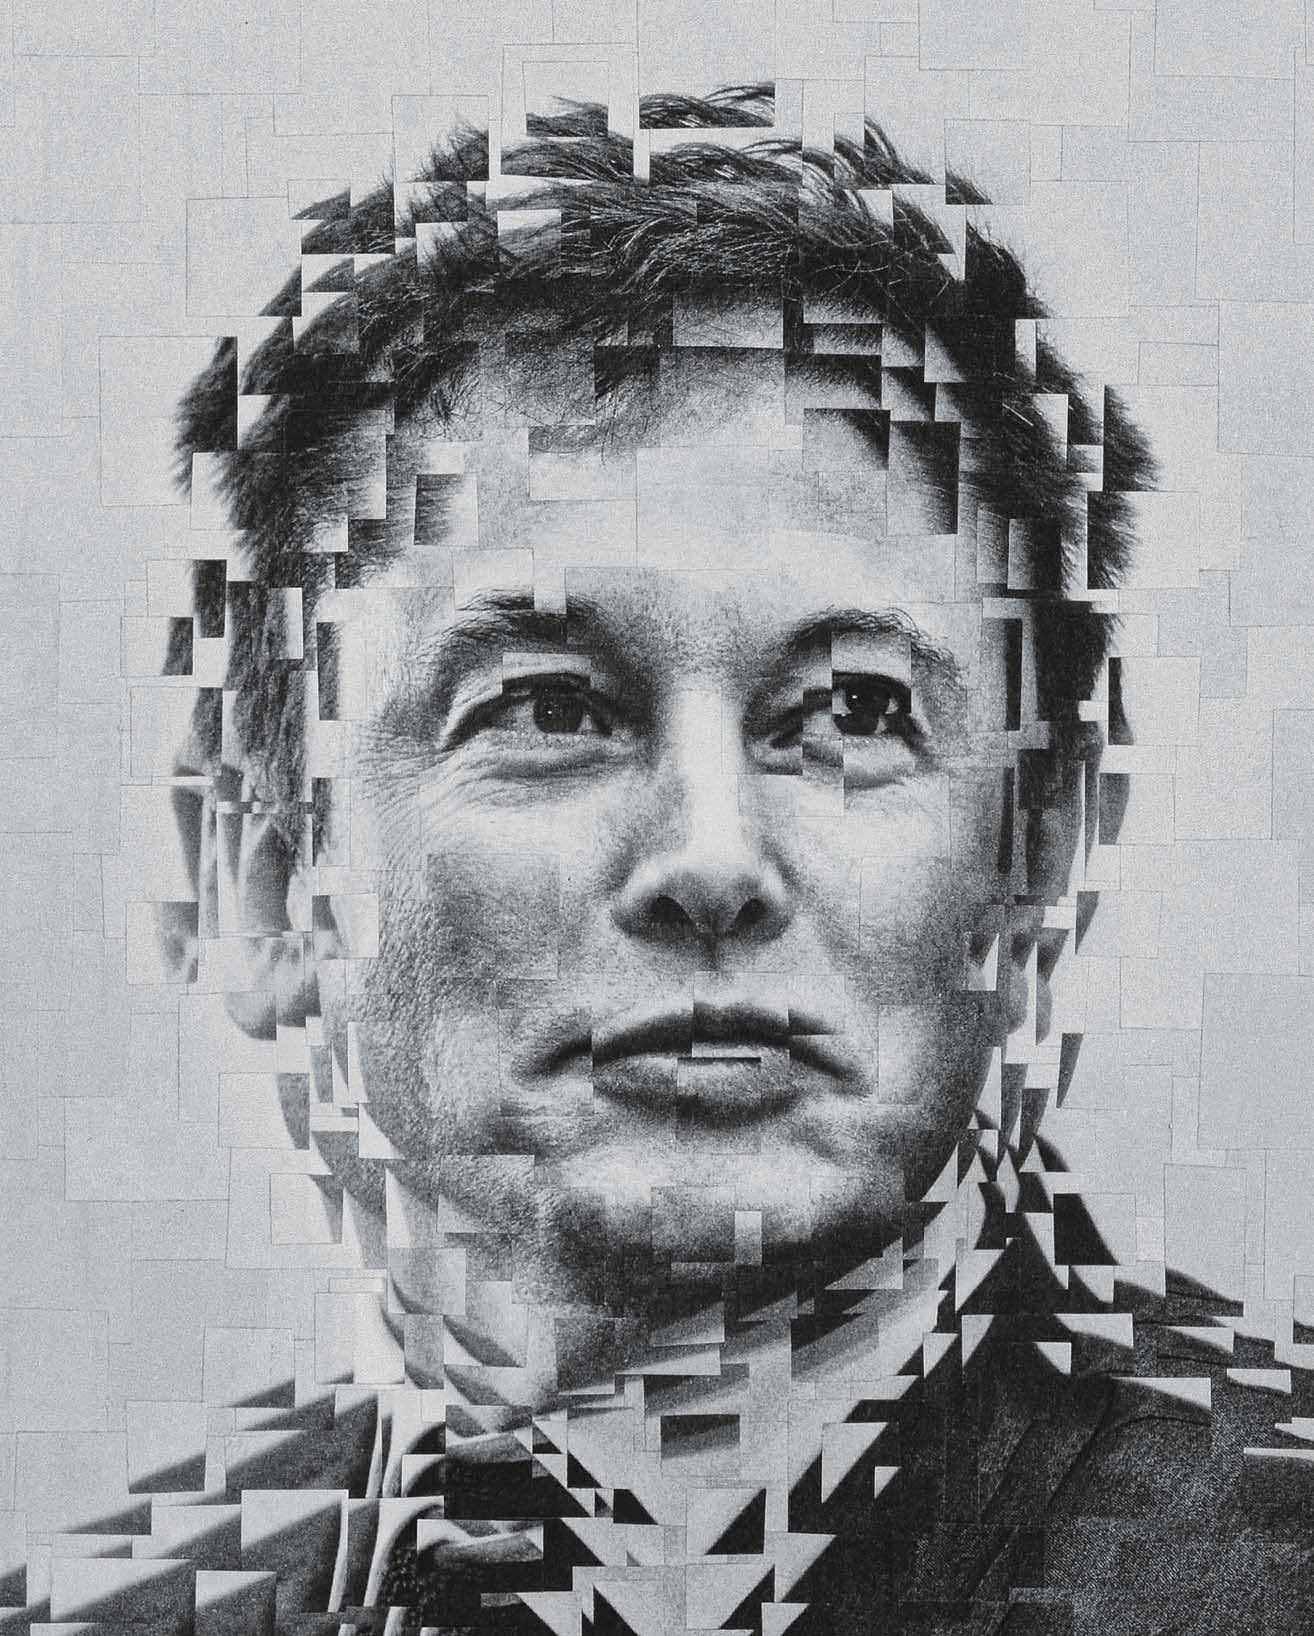 Elon Musk Has No Fear